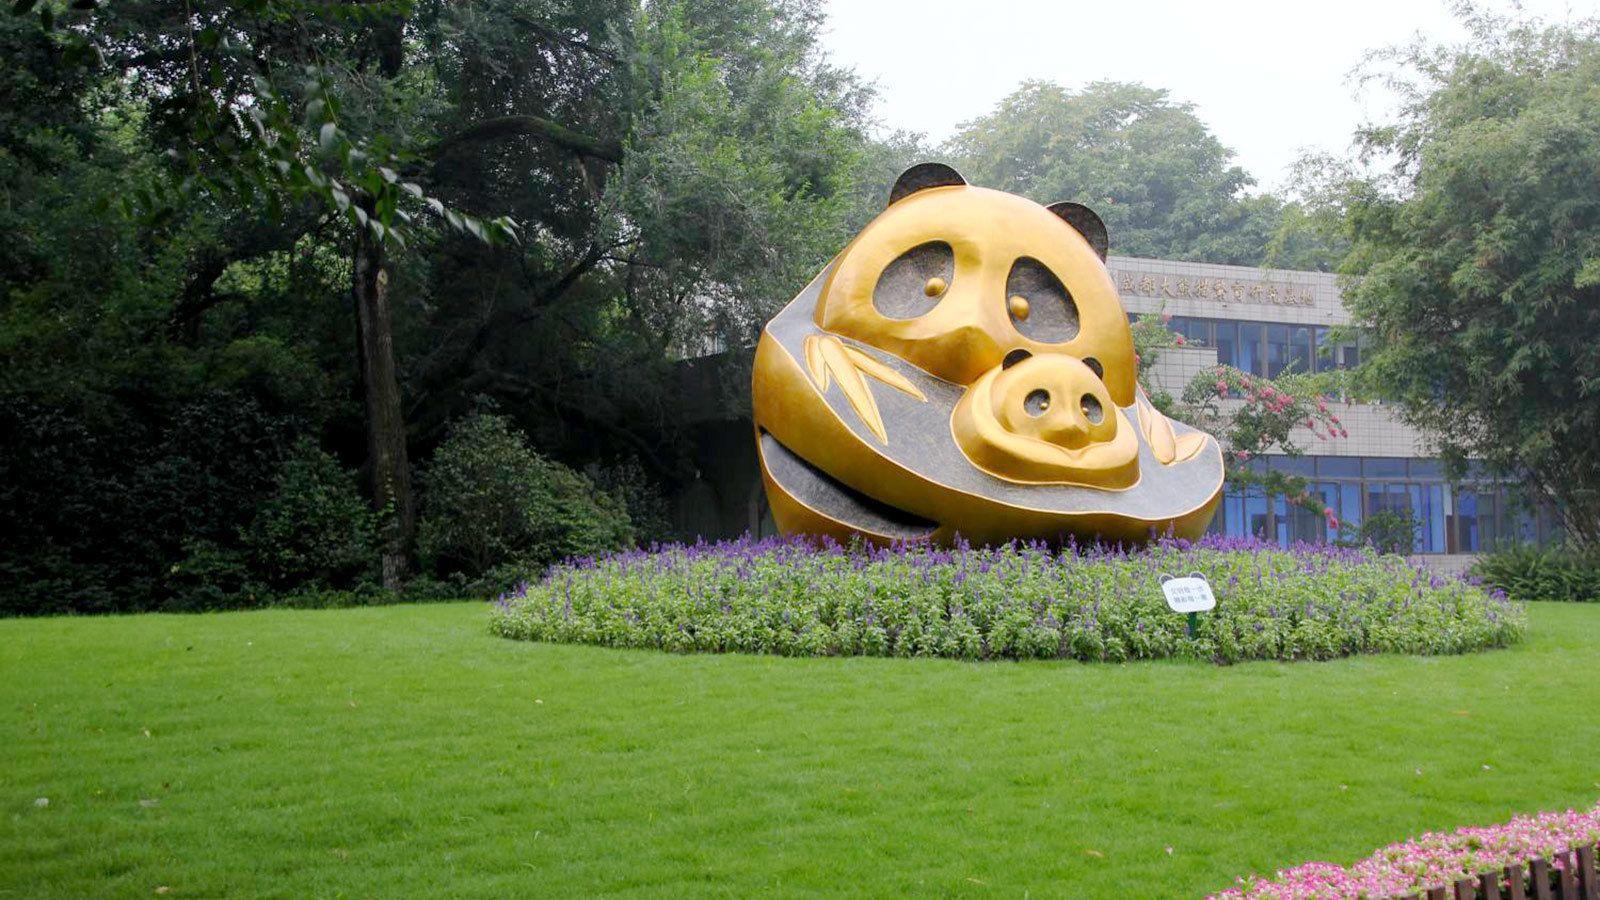 Statue of two pandas on the Panda Tour in Chengdu